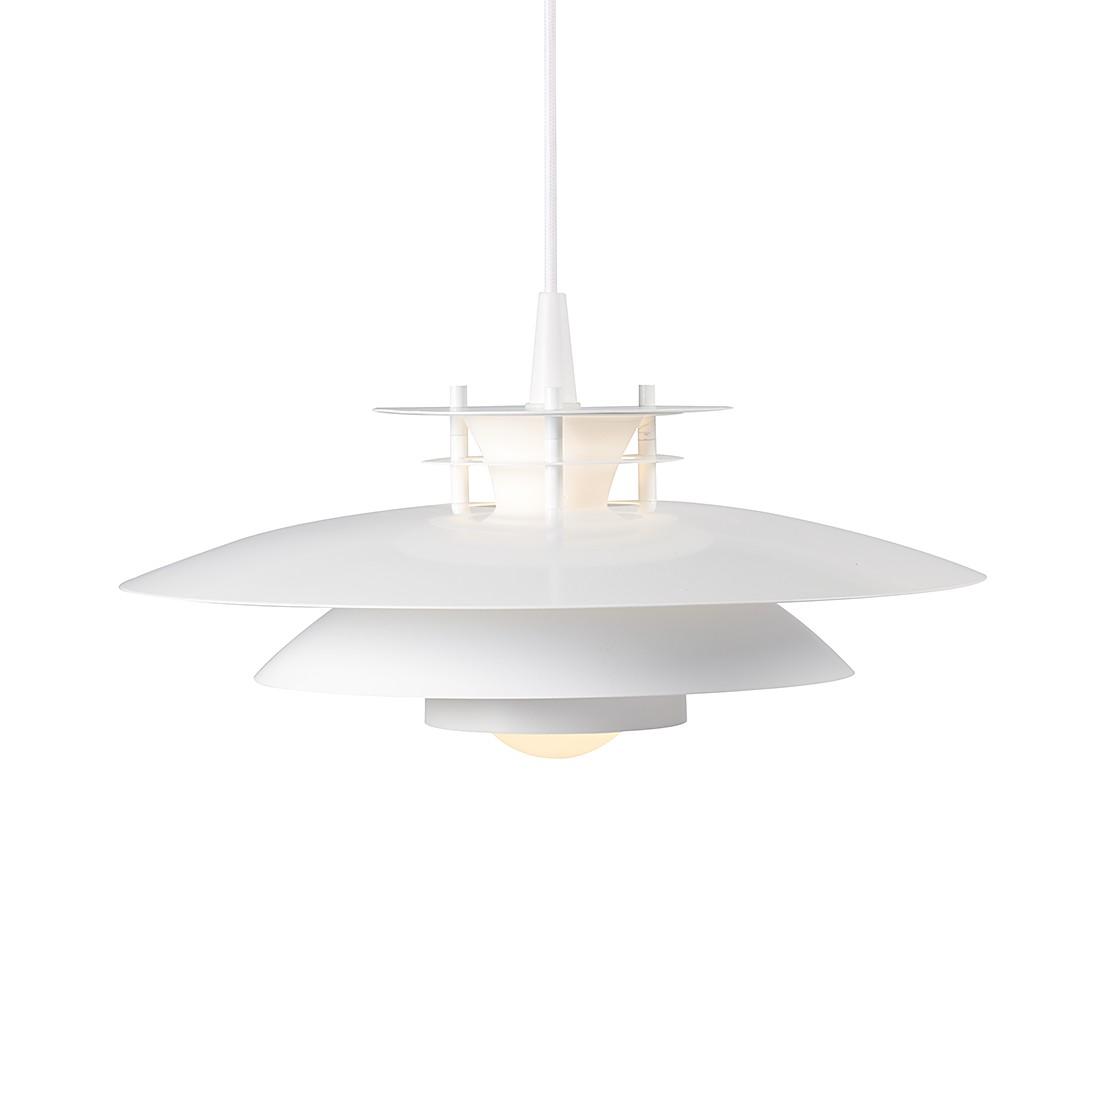 EEK A++, Pendelleuchte LD 240 - Metall/Glas Weiß, Nordlux